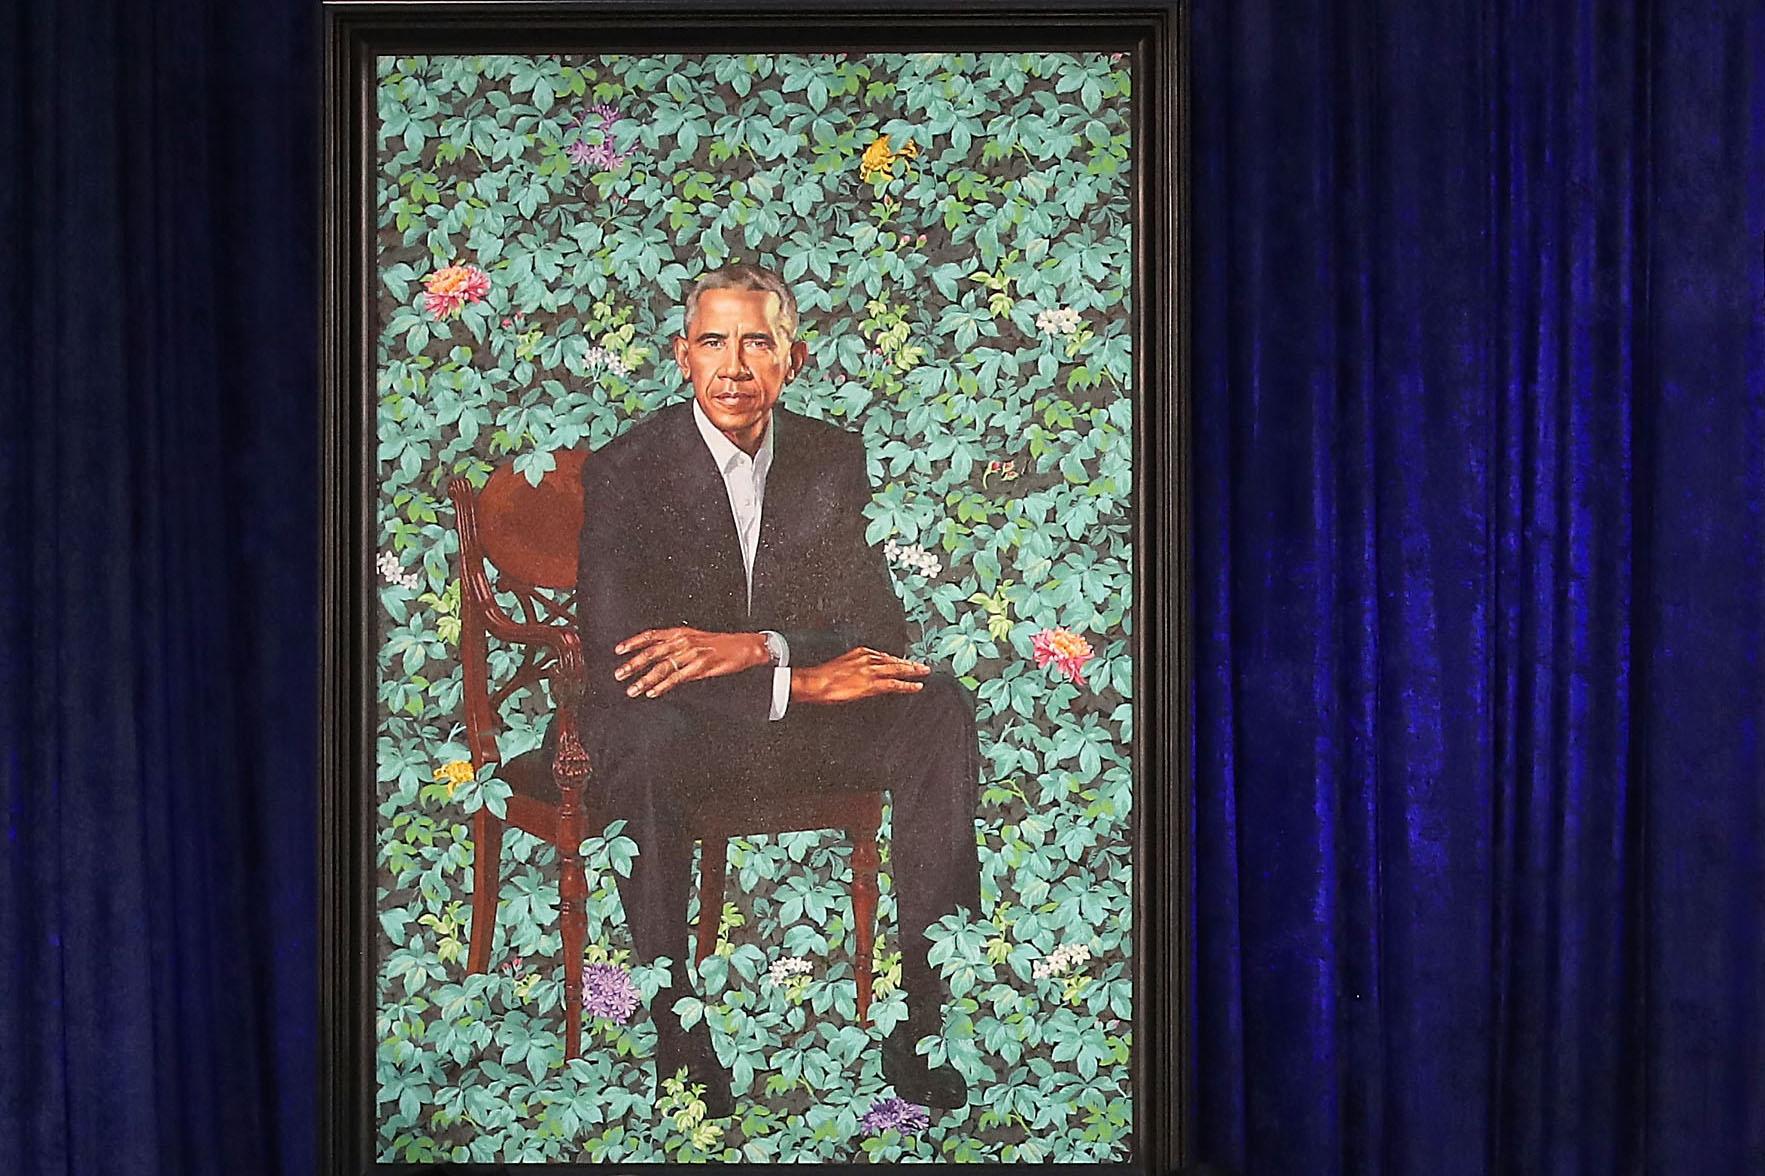 barack-obama-national-gallery-portrait